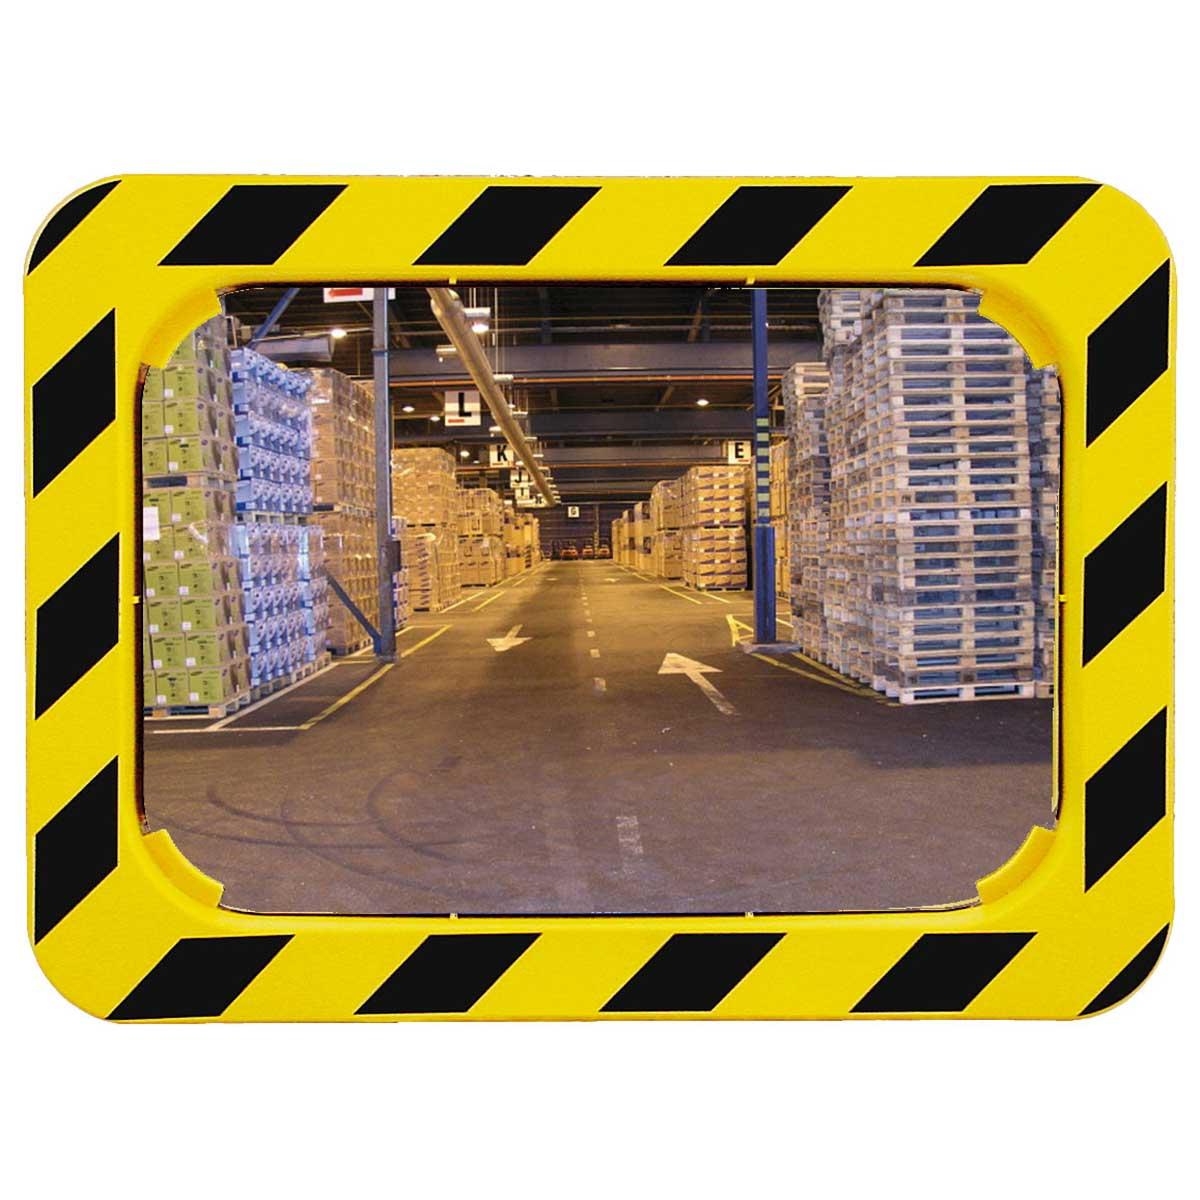 Espejos para naves industriales, almacenes, fábricas, etc